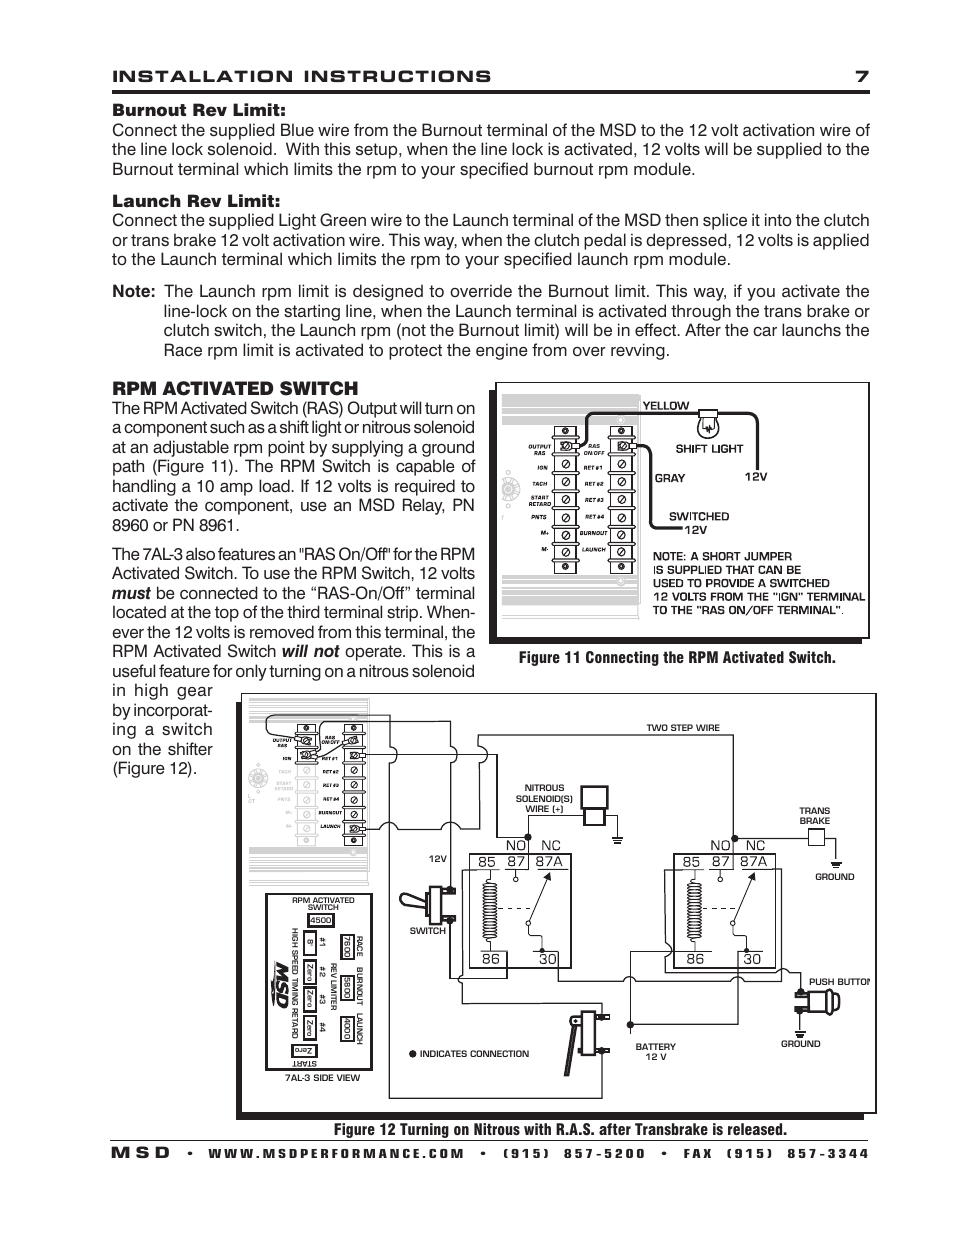 msd 7330 7al 3 ignition control installation page7?resize\\\=665%2C861 msd 8350 wiring diagram msd box wiring diagram \u2022 wiring diagrams msd 7al 2 wiring diagram at eliteediting.co